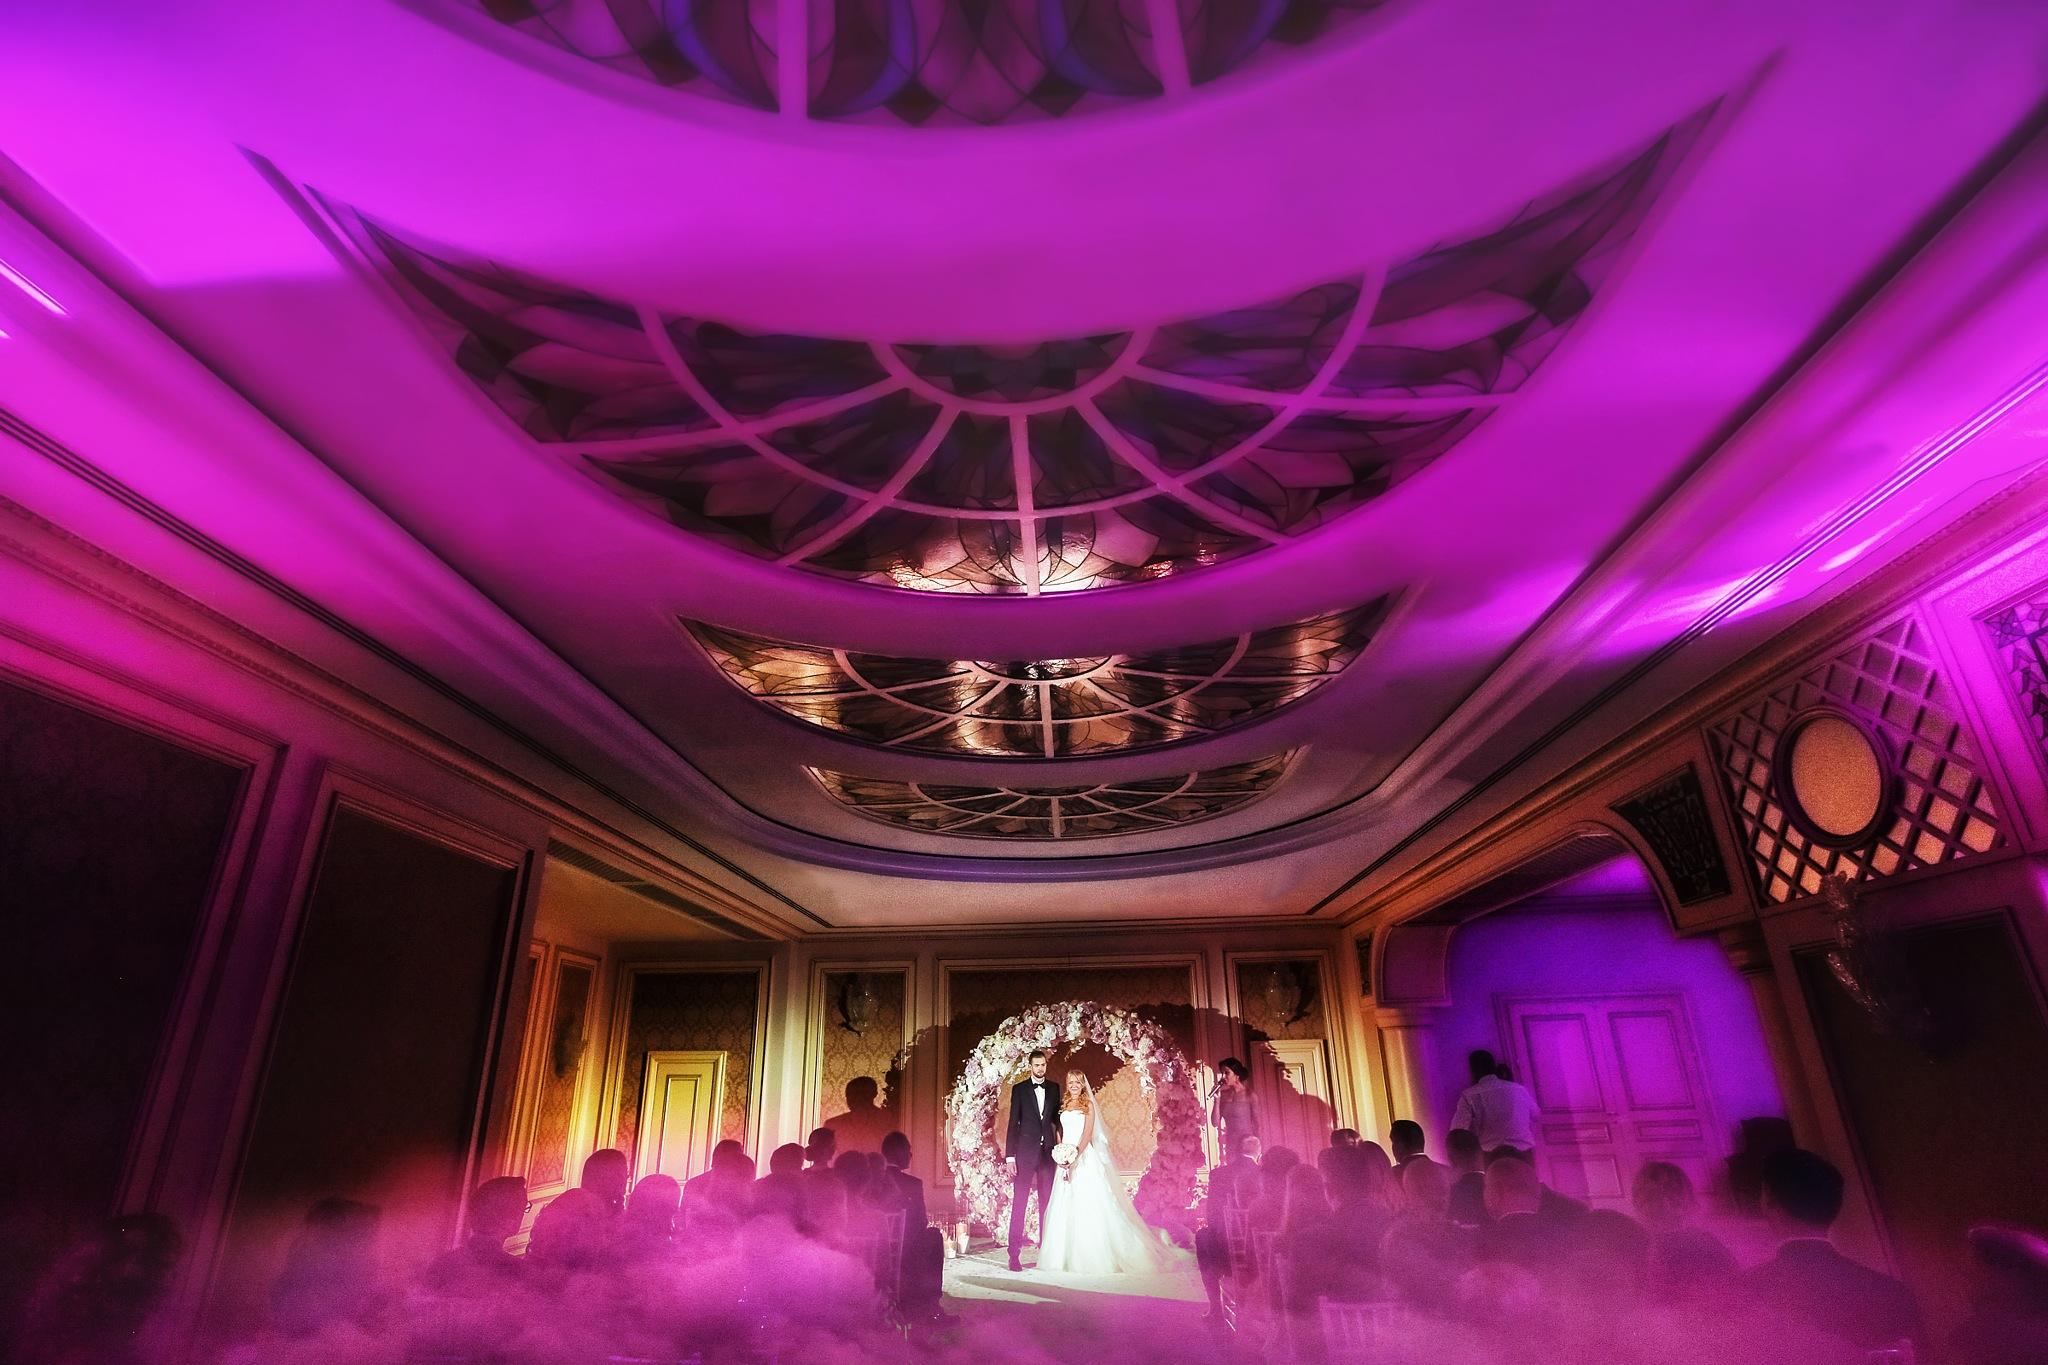 Violet wedding by Dimitrij